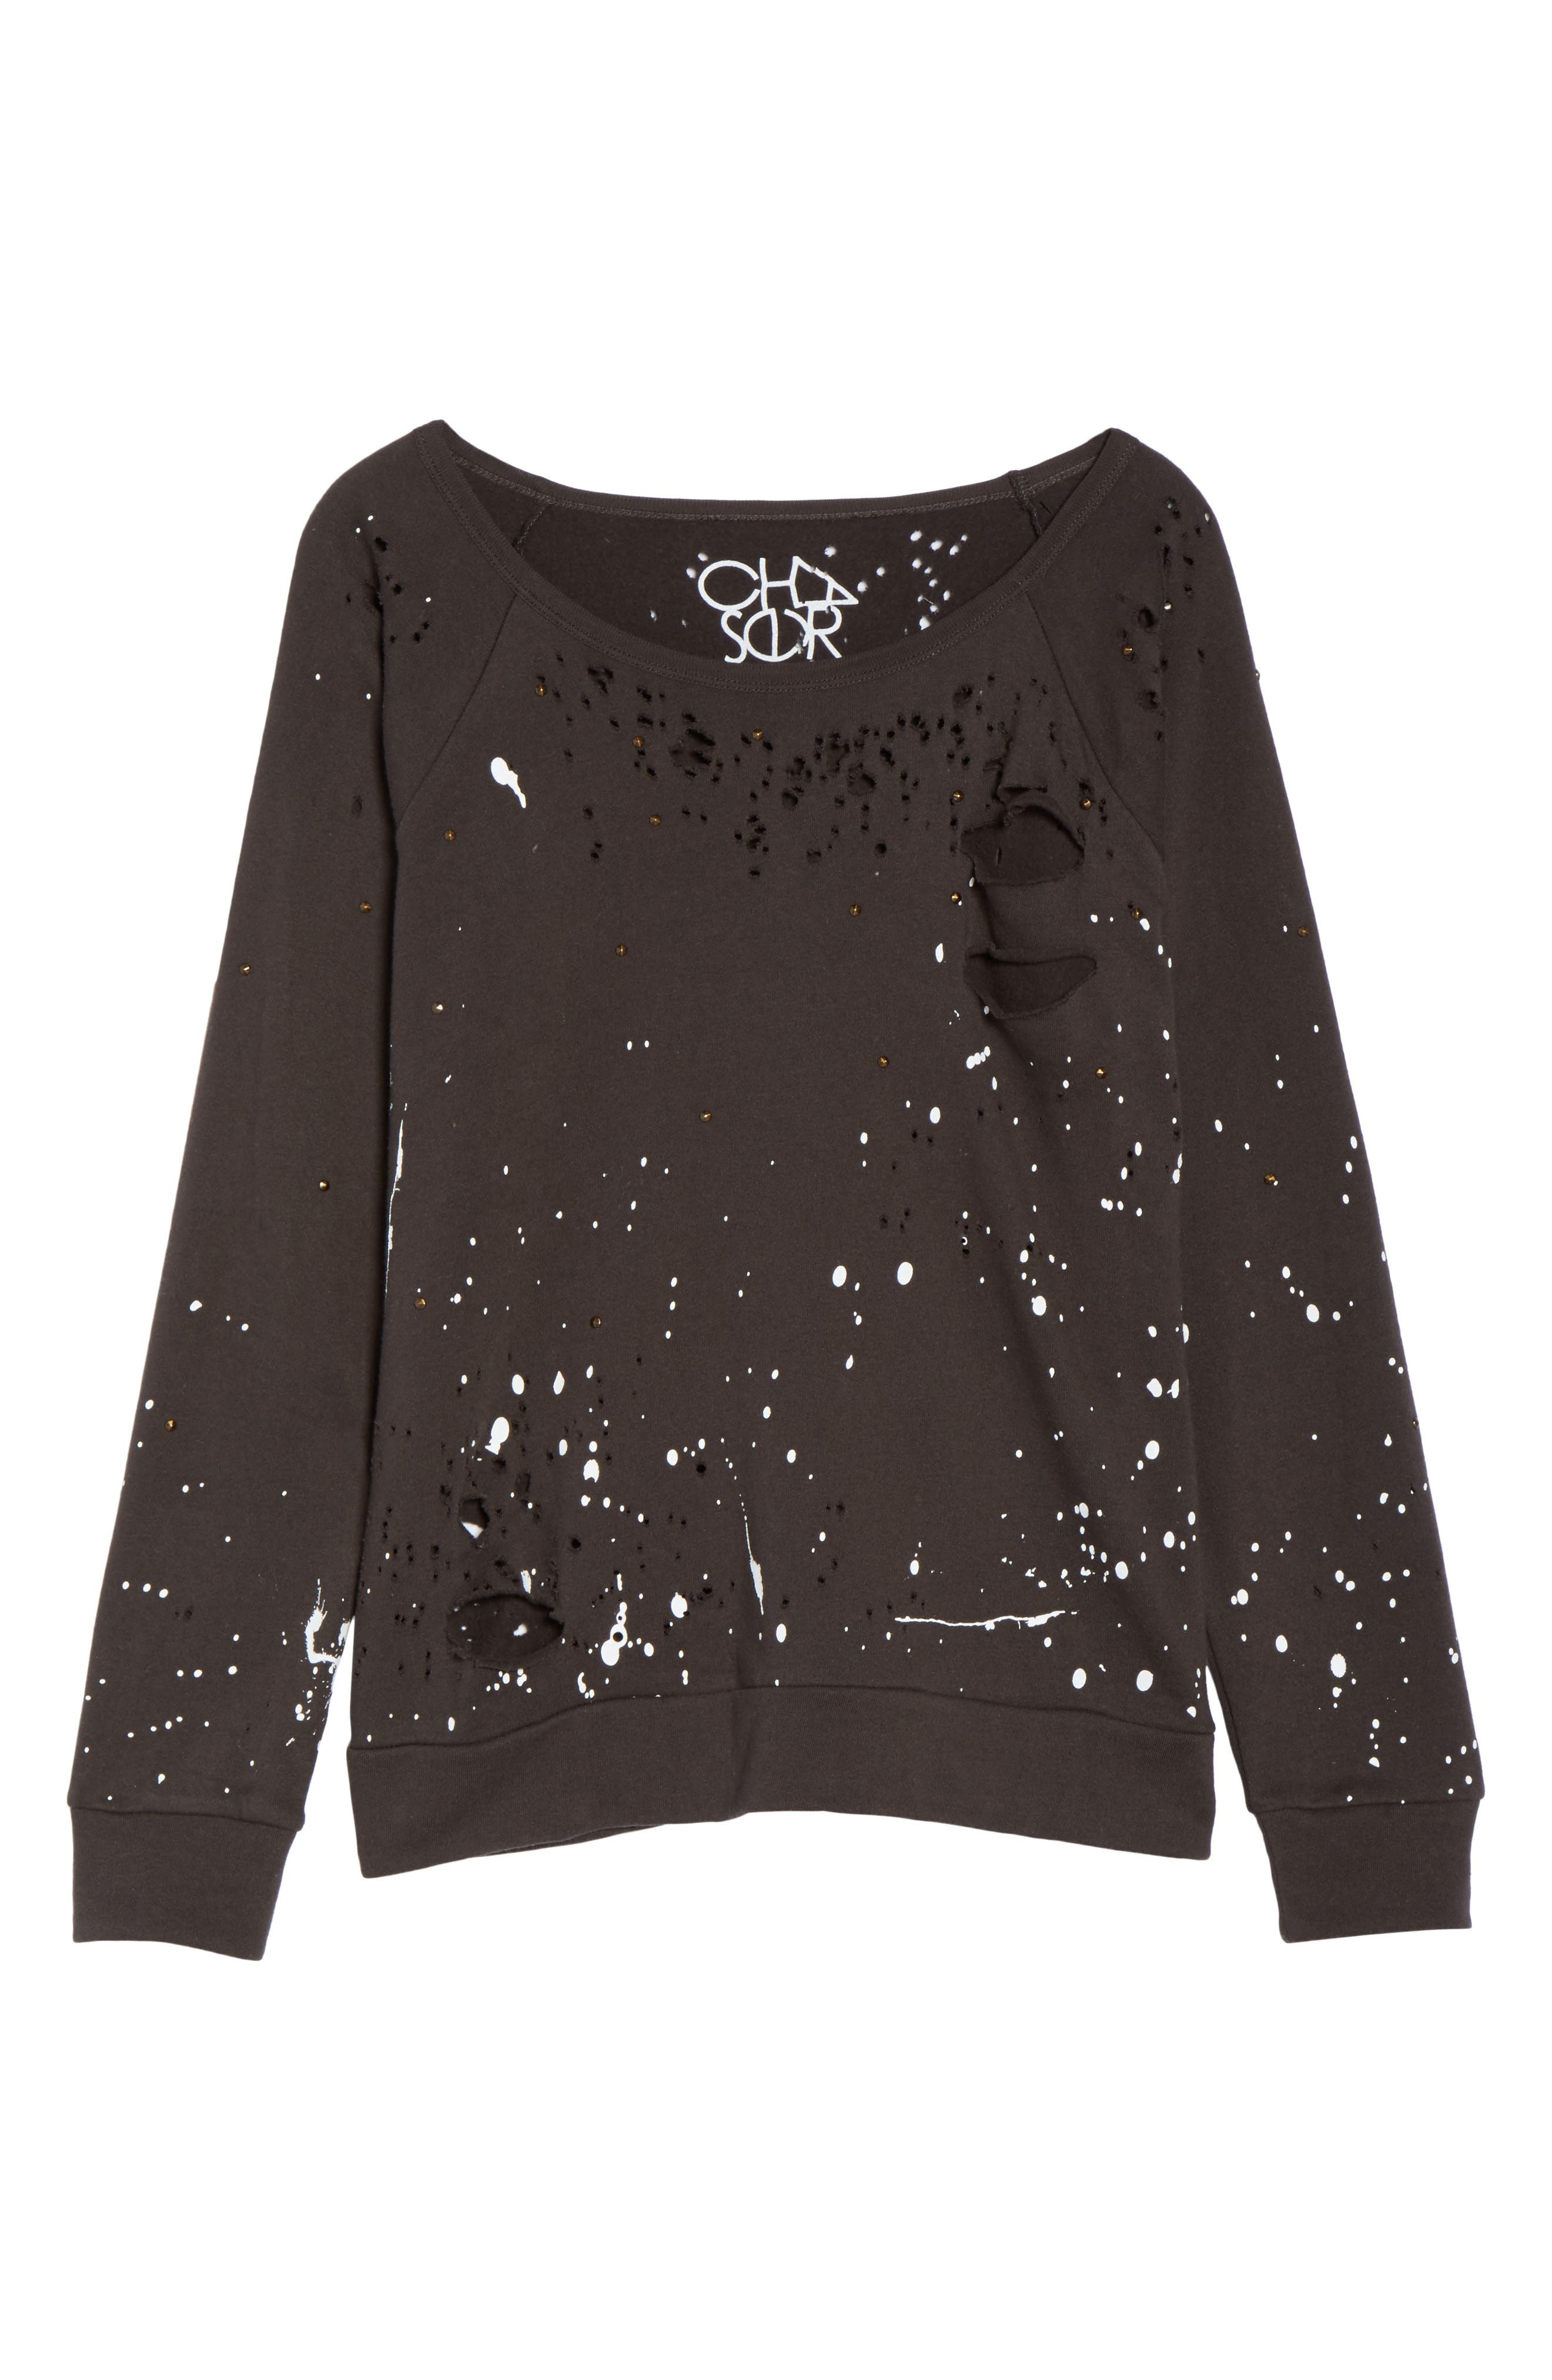 Distressed Fleece Sweatshirt,                             Alternate thumbnail 6, color,                             007